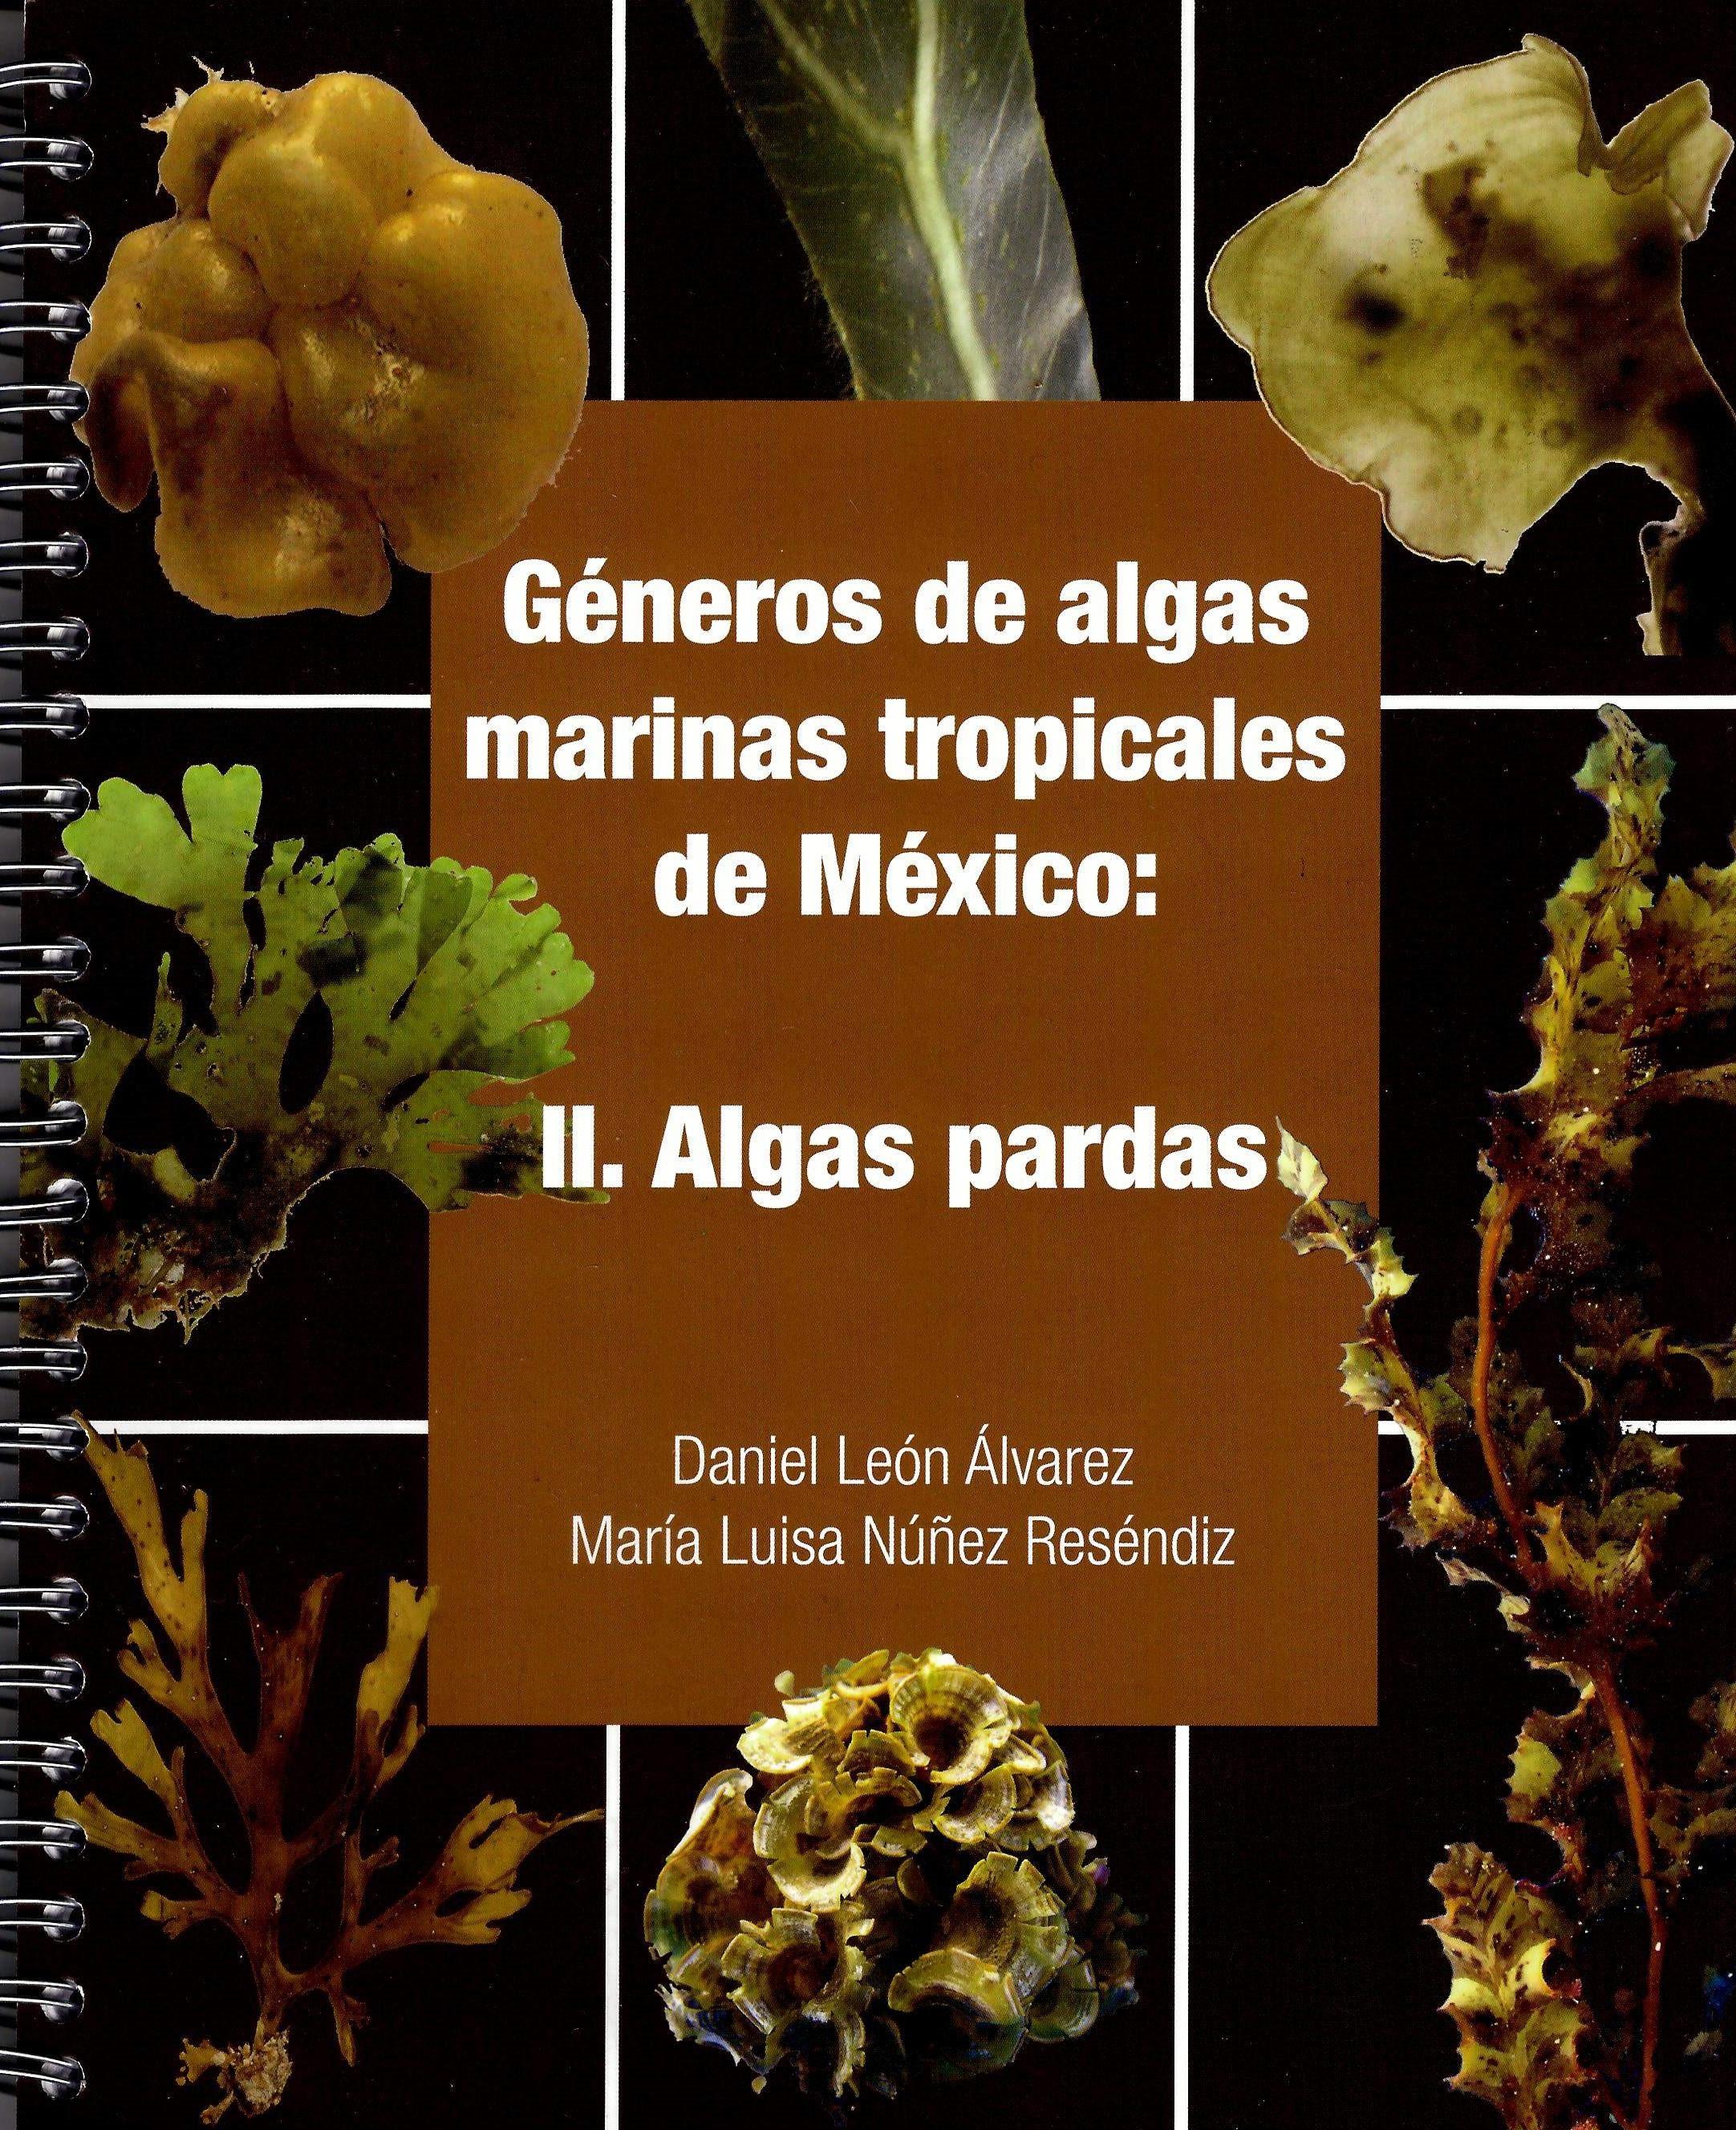 Géneros de algas marinas tropicales de México, II Algas pardas